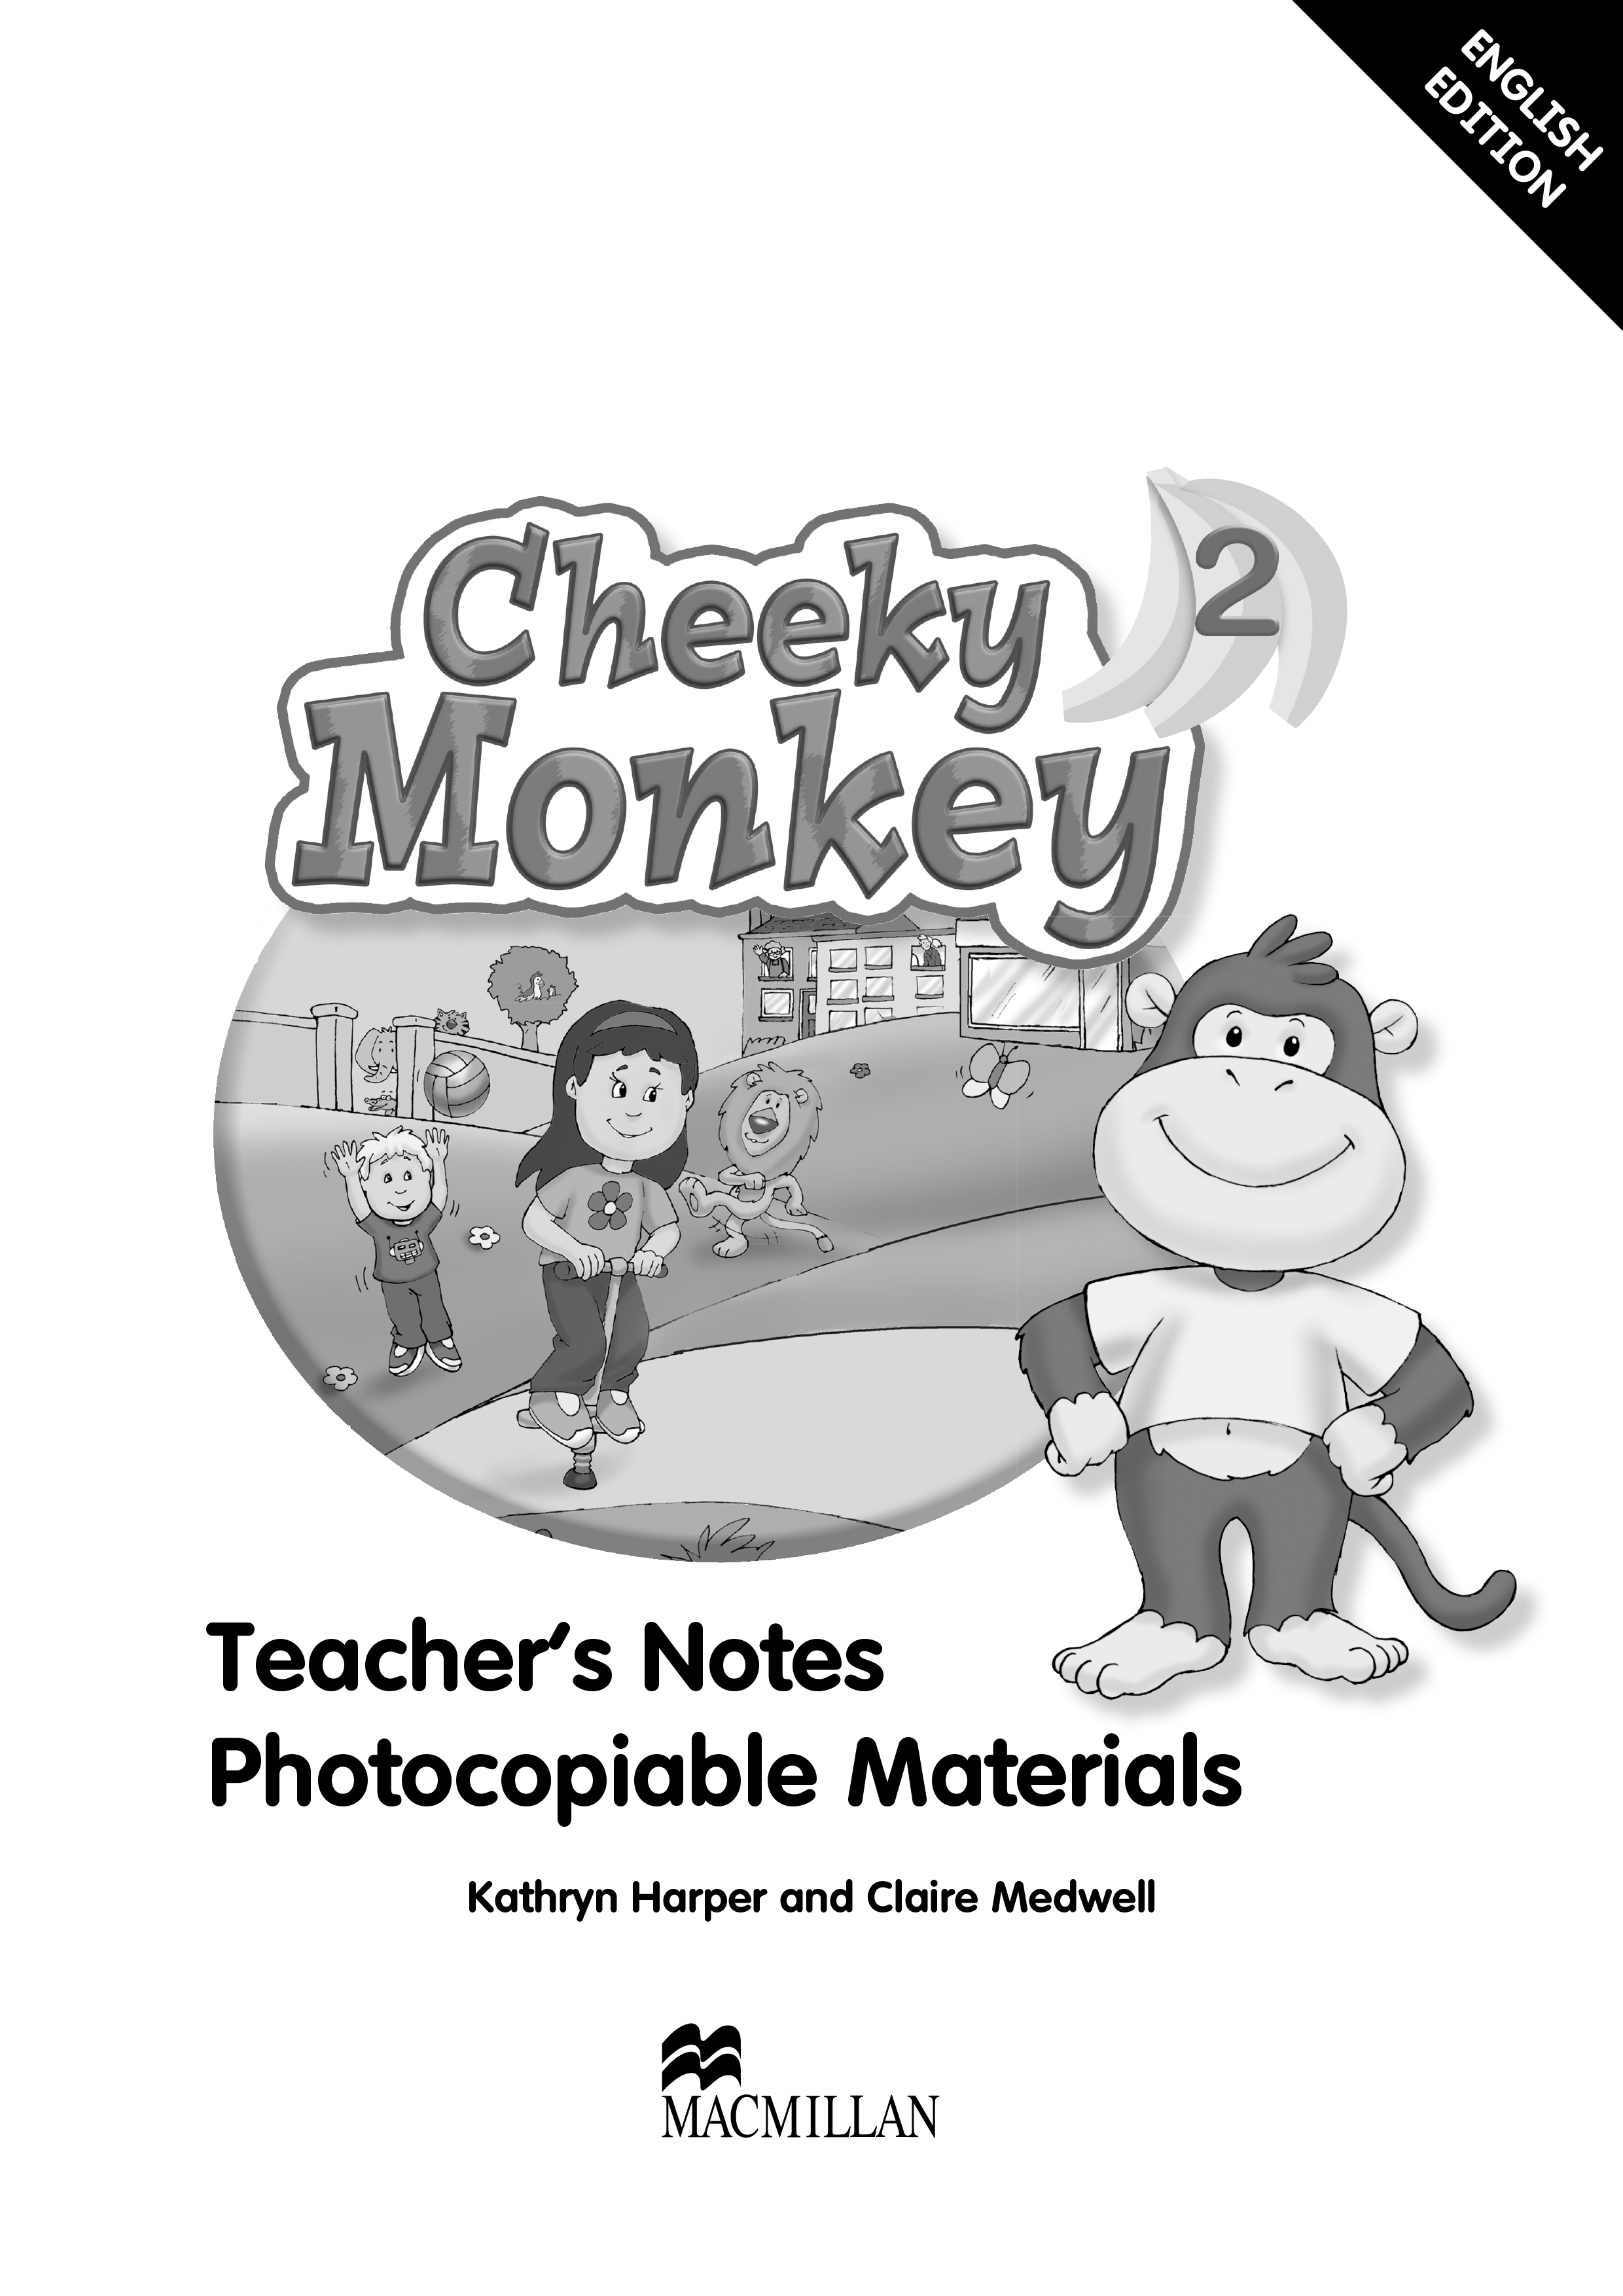 Cheeky Monkey 2 Teacher